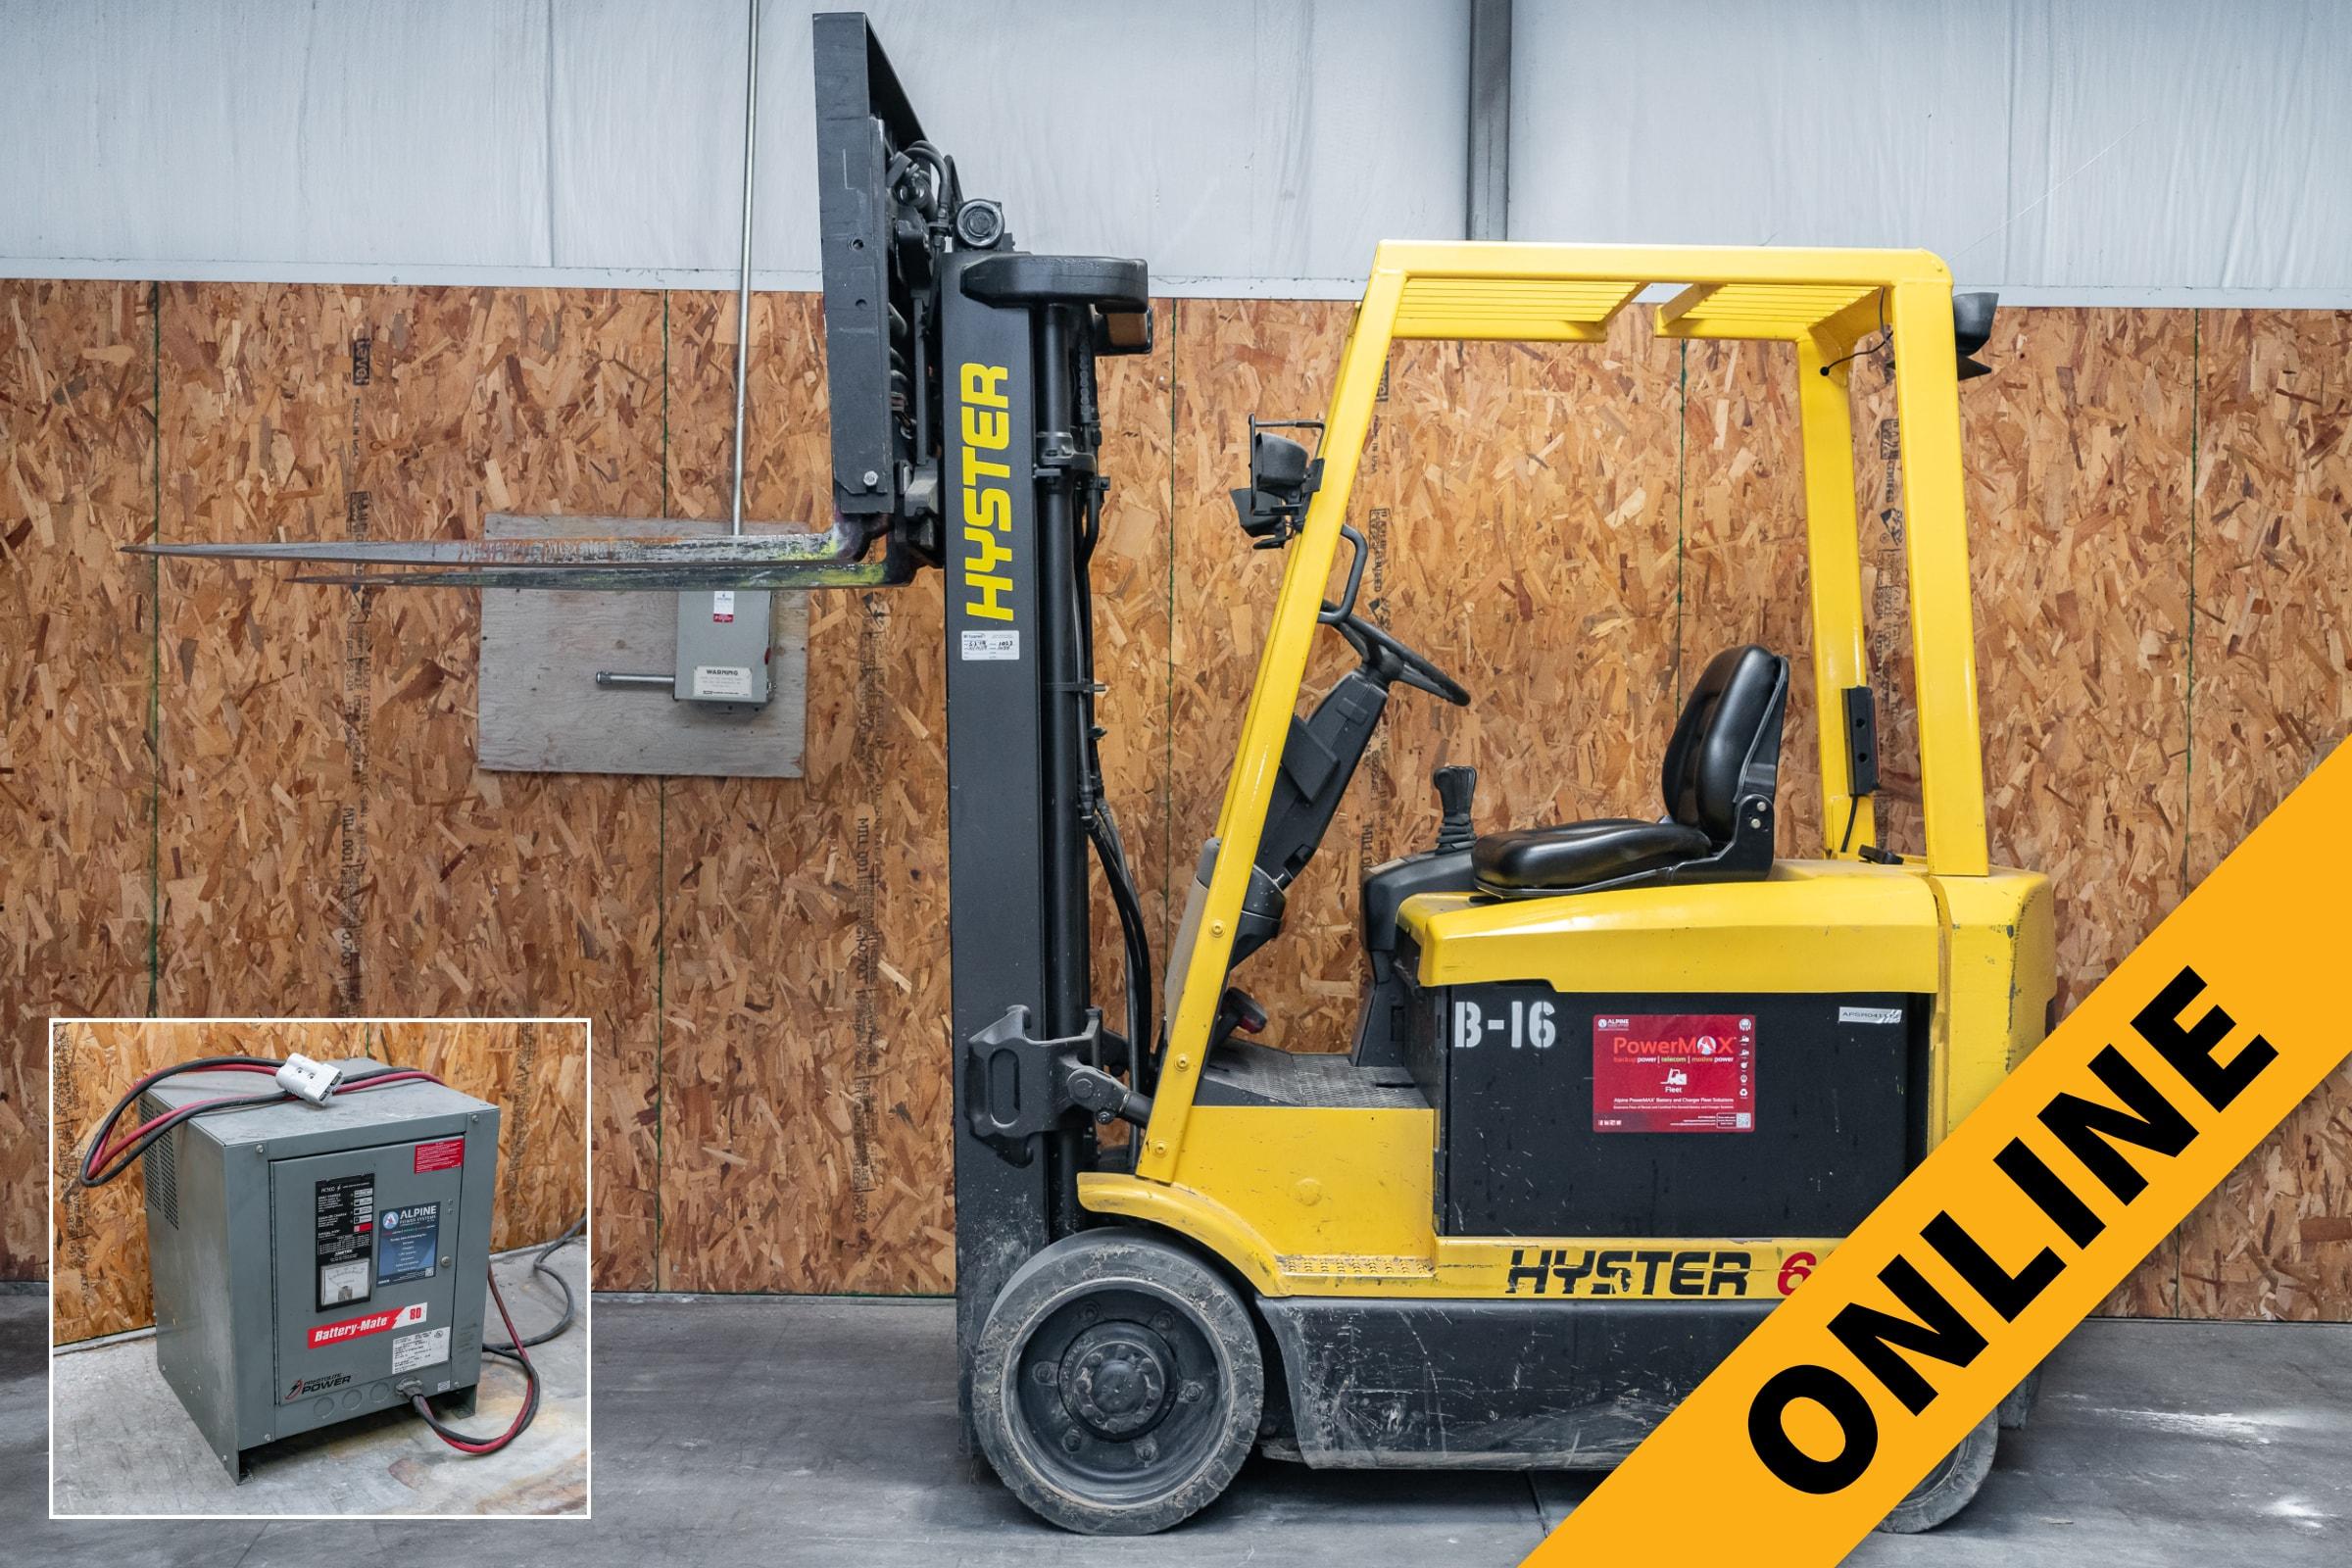 Hyster Lift Truck Online Auction